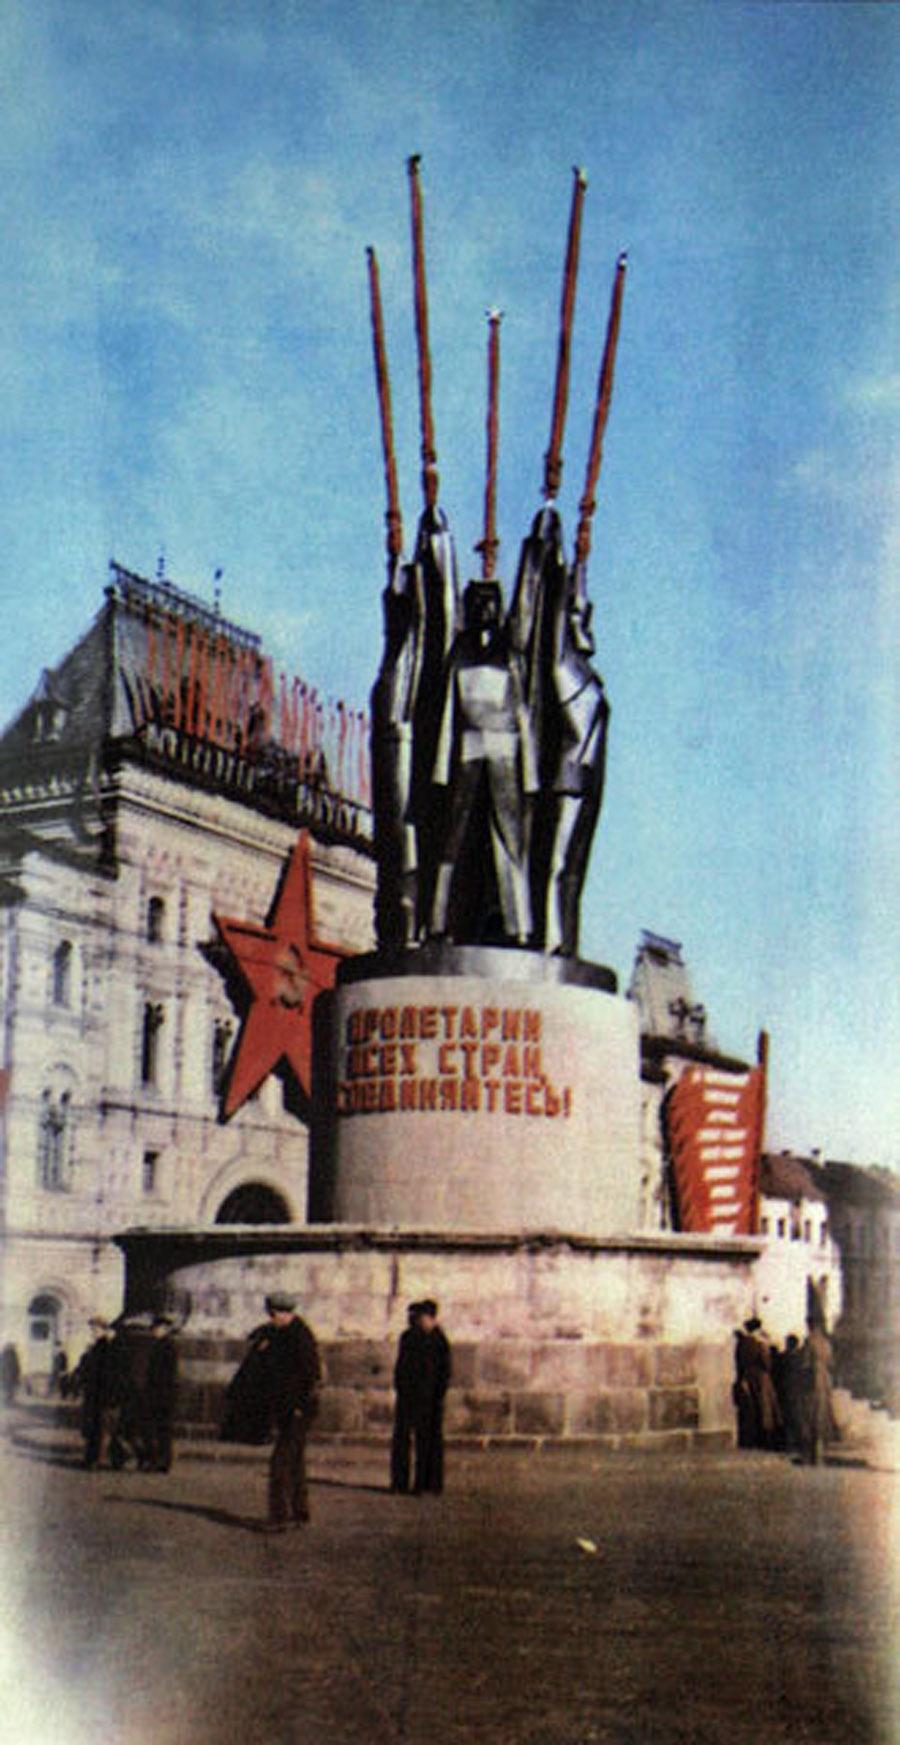 https://img-fotki.yandex.ru/get/197807/48517161.4f/0_1df20f_93caafaa_orig